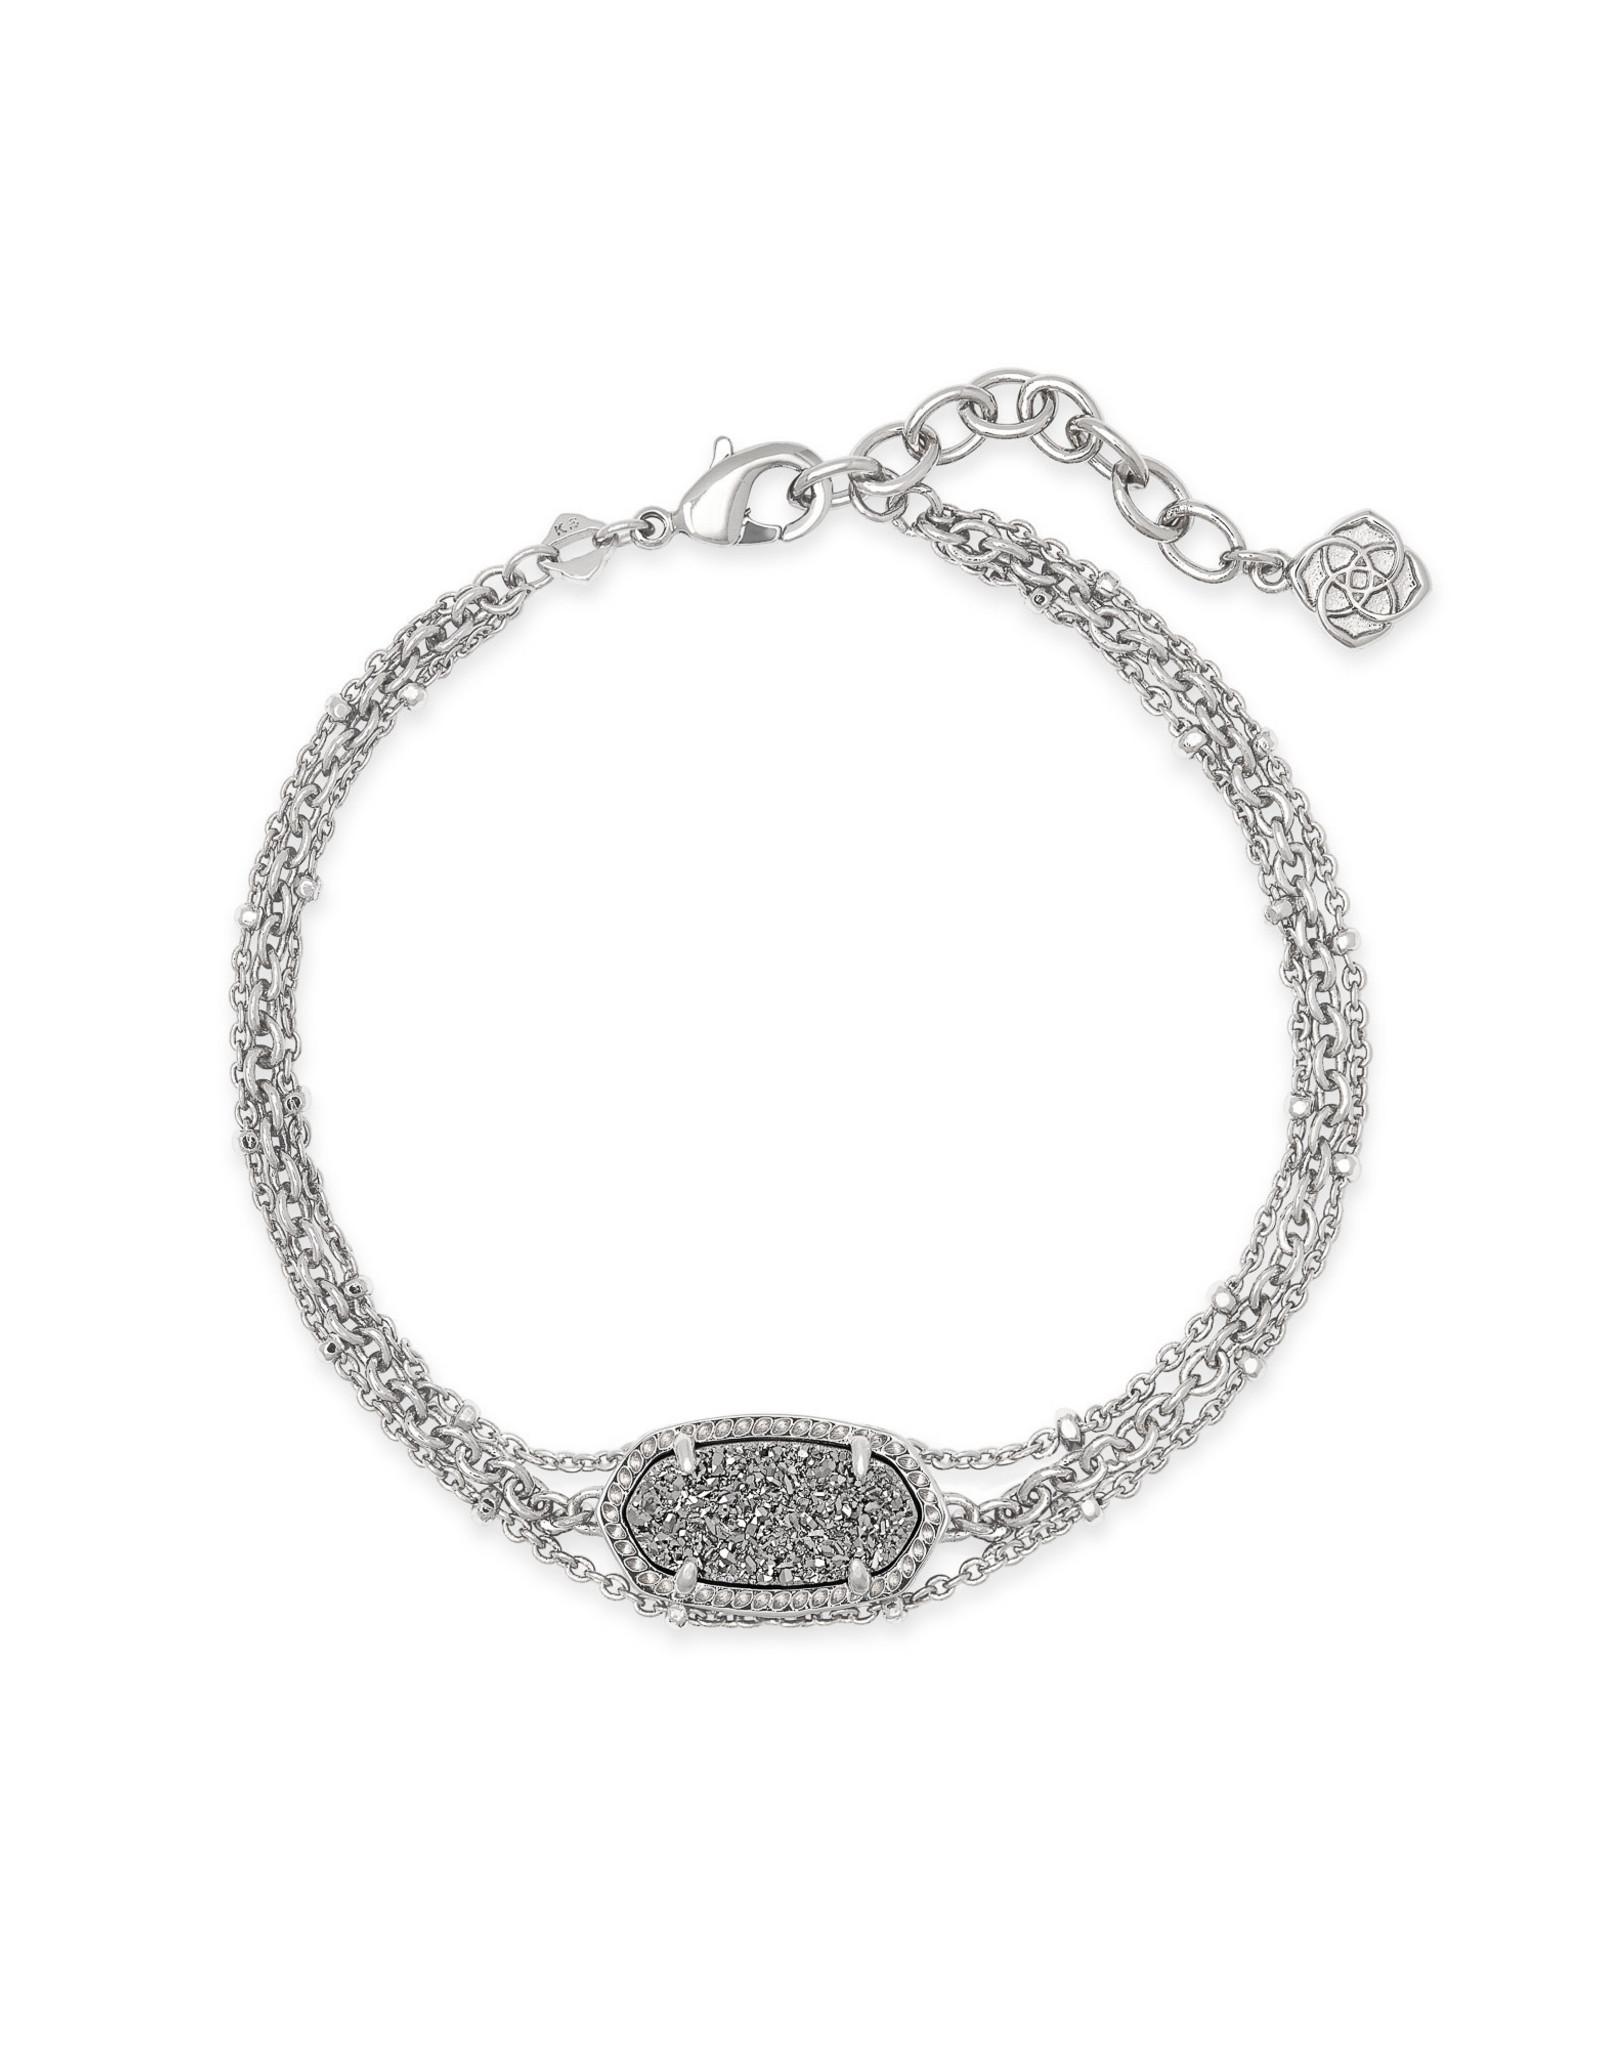 Kendra Scott Elaina Multi Strand Bracelet - Platinum Drusy/Rhodium